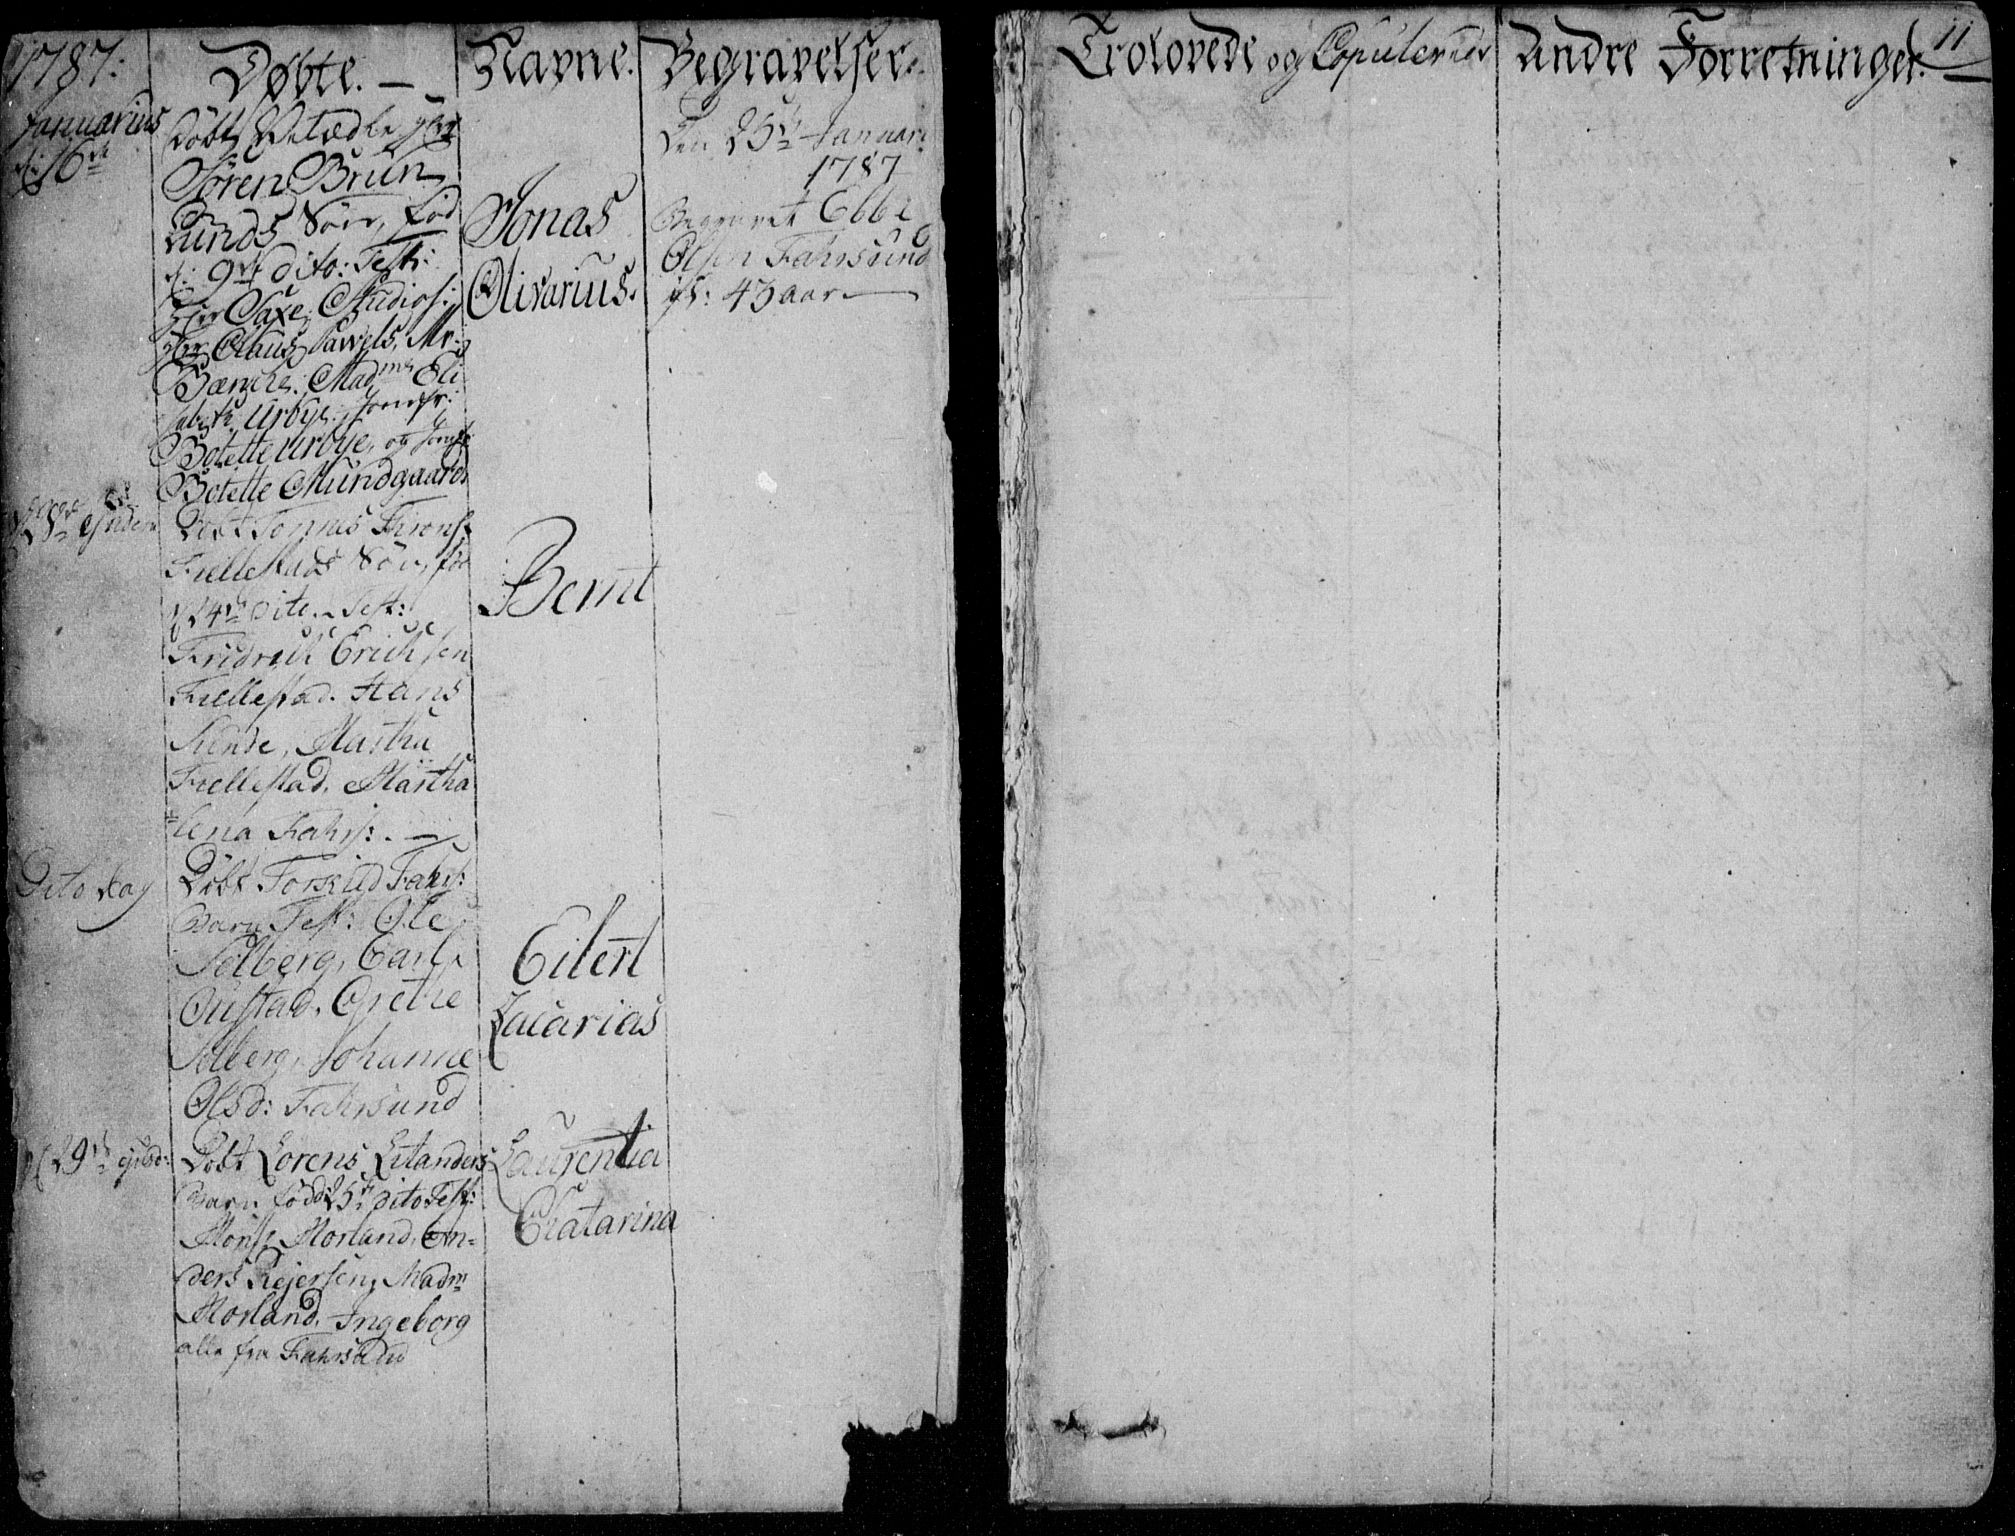 SAK, Farsund sokneprestkontor, F/Fa/L0001: Ministerialbok nr. A 1, 1784-1815, s. 11